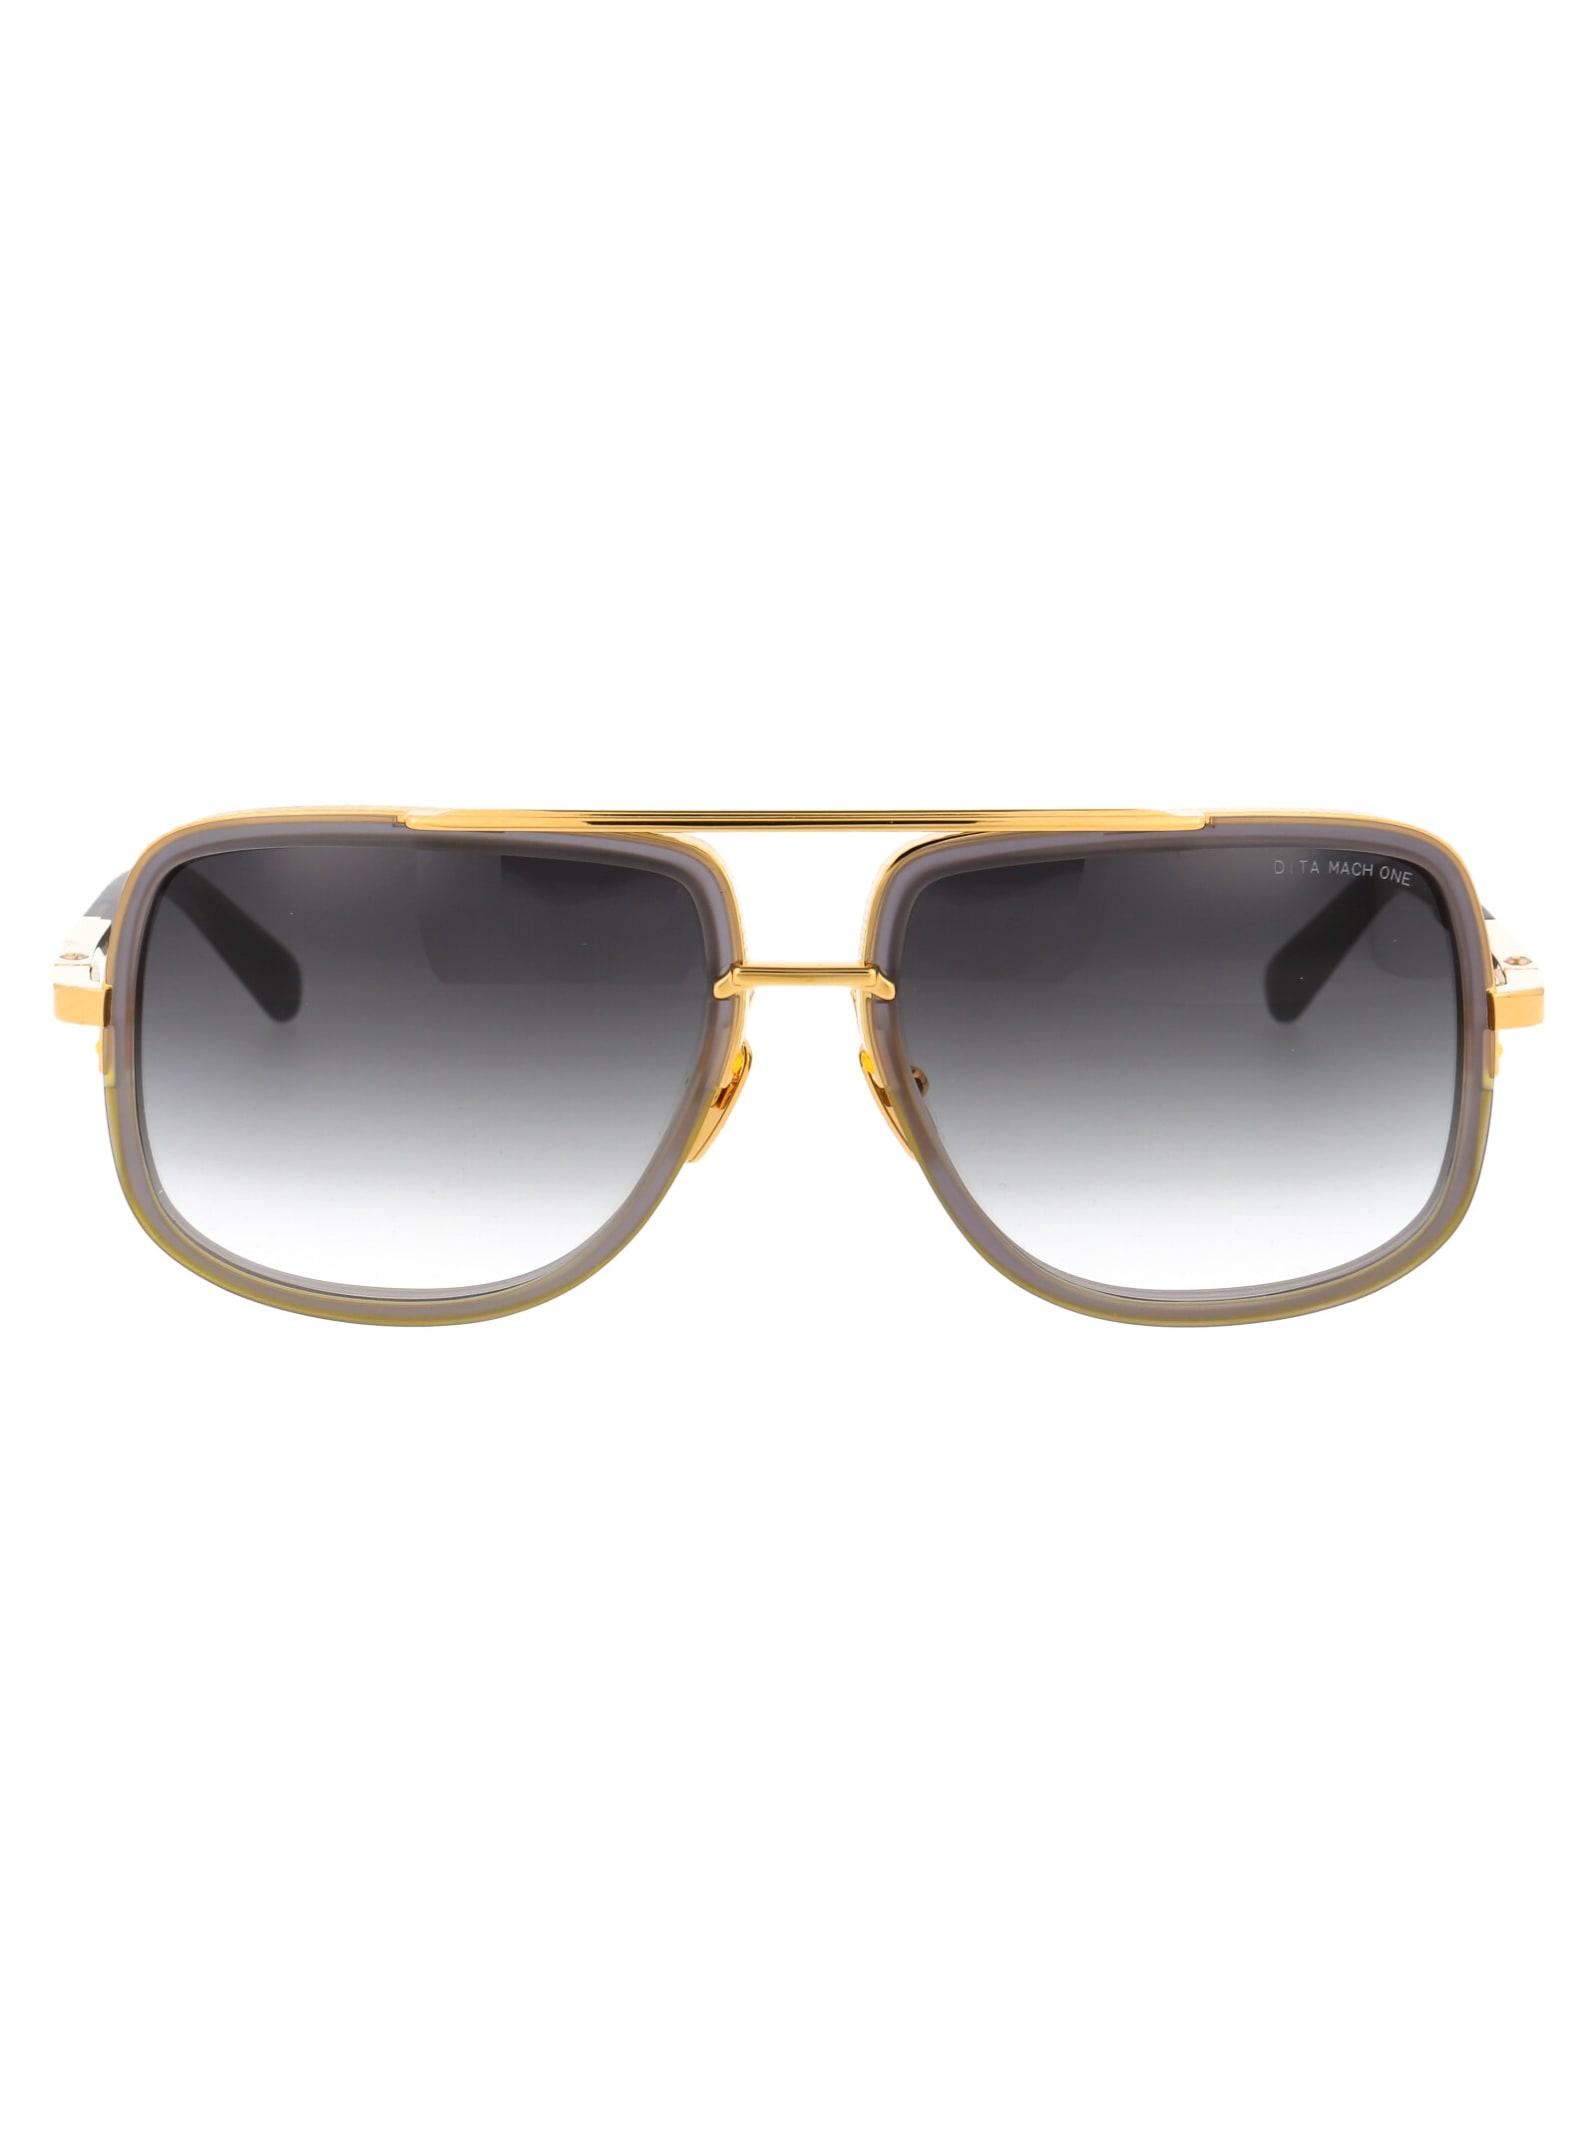 Mach-one Sunglasses